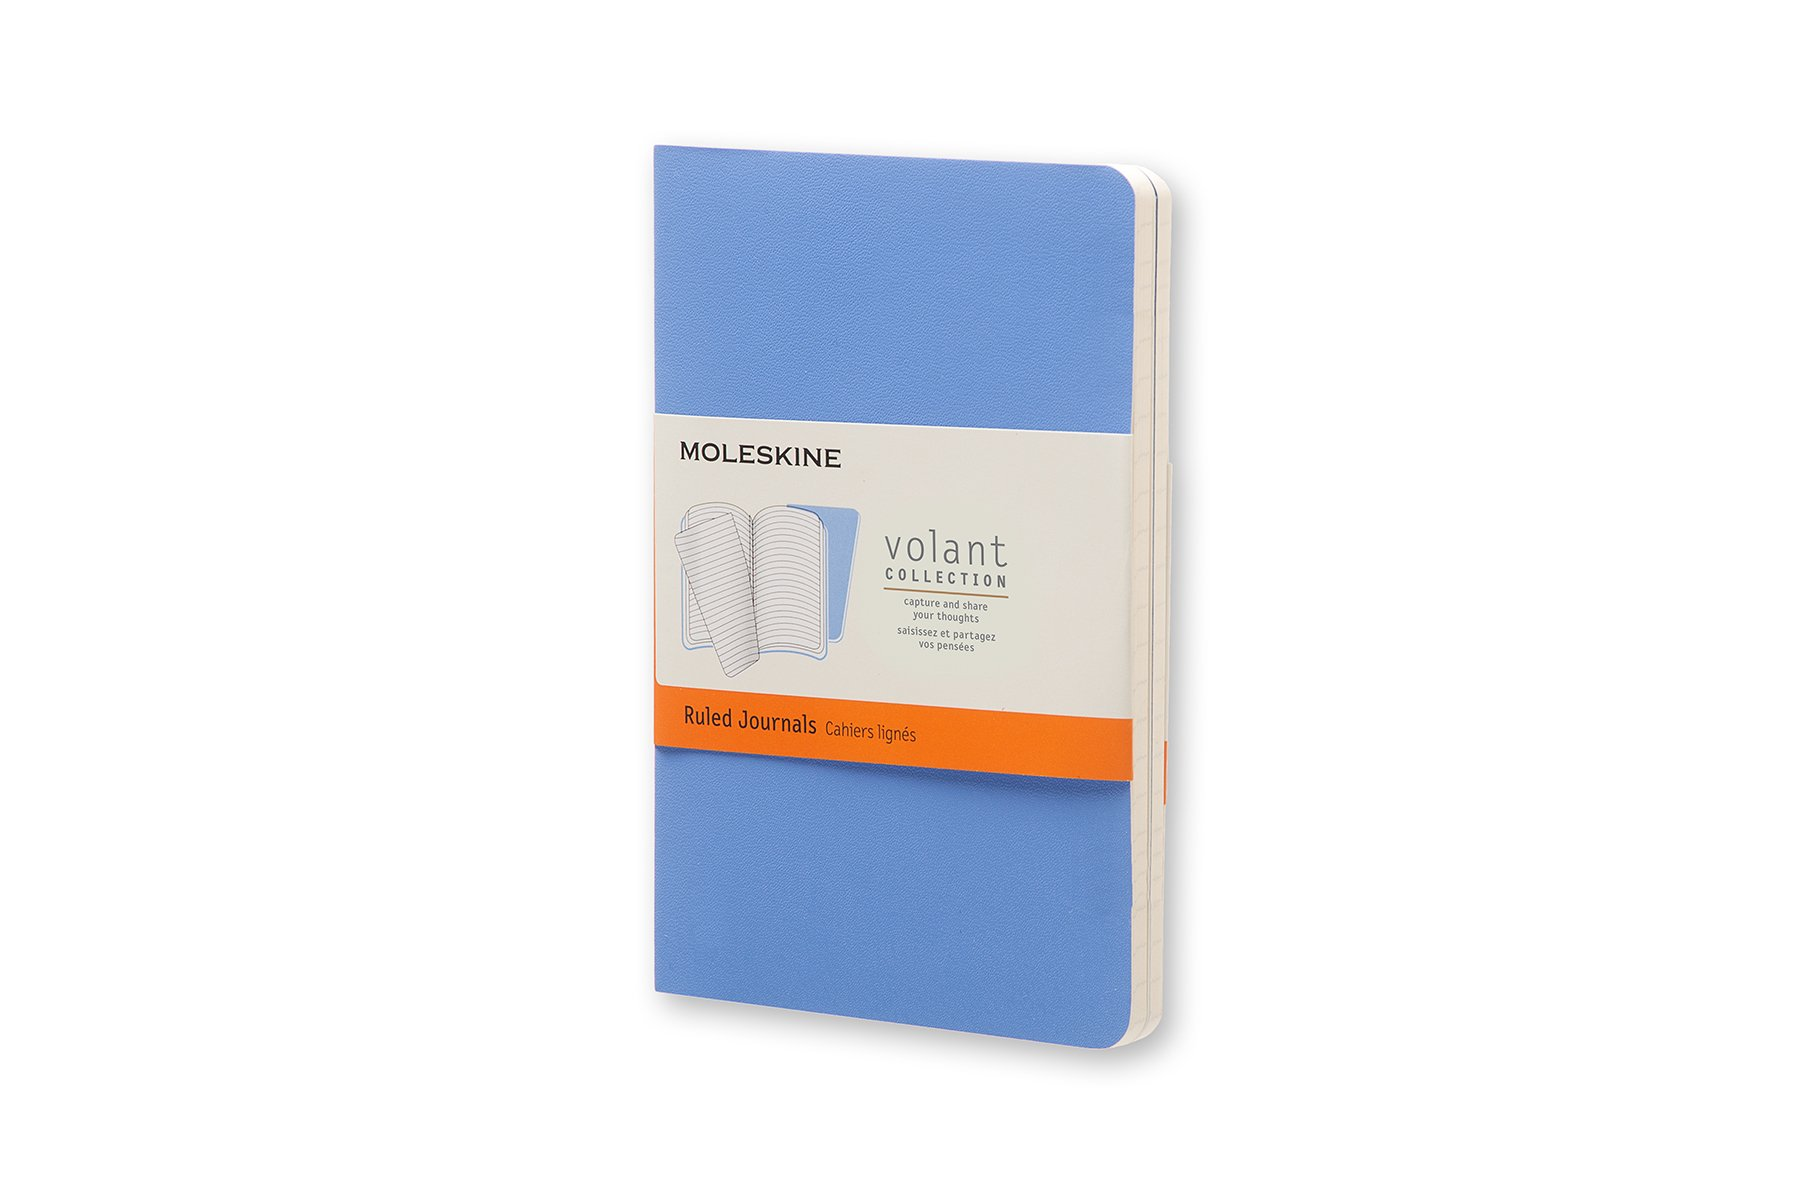 Moleskine Volant Soft Cover Journal, Blue, Ruled, Pocket x2